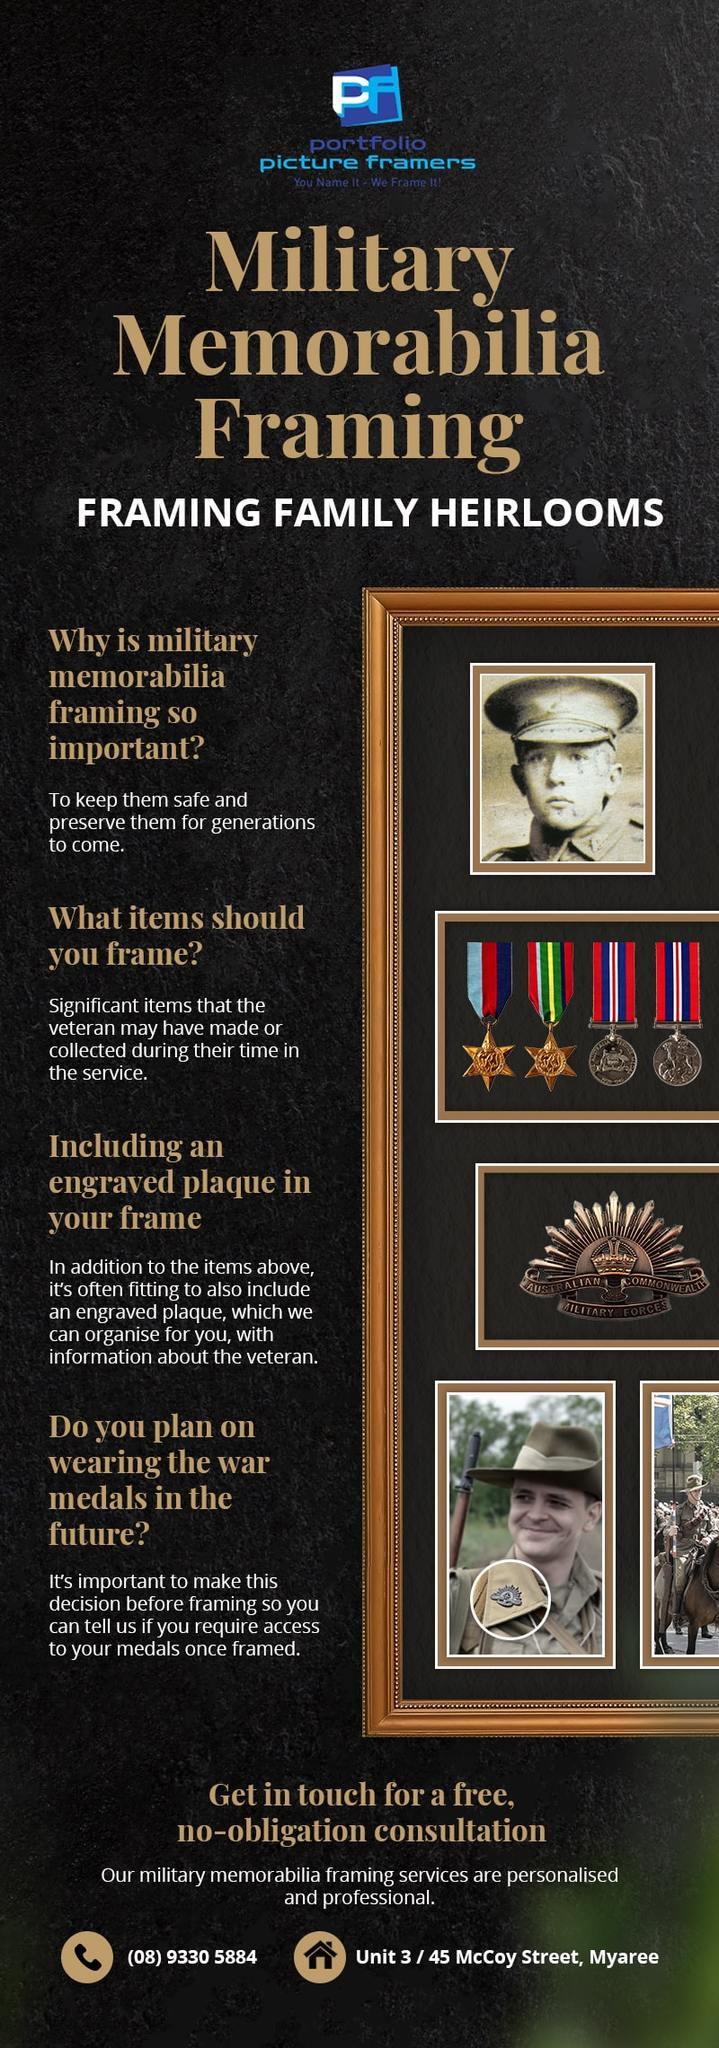 military memorabilia framing infographic pp 2048x2048